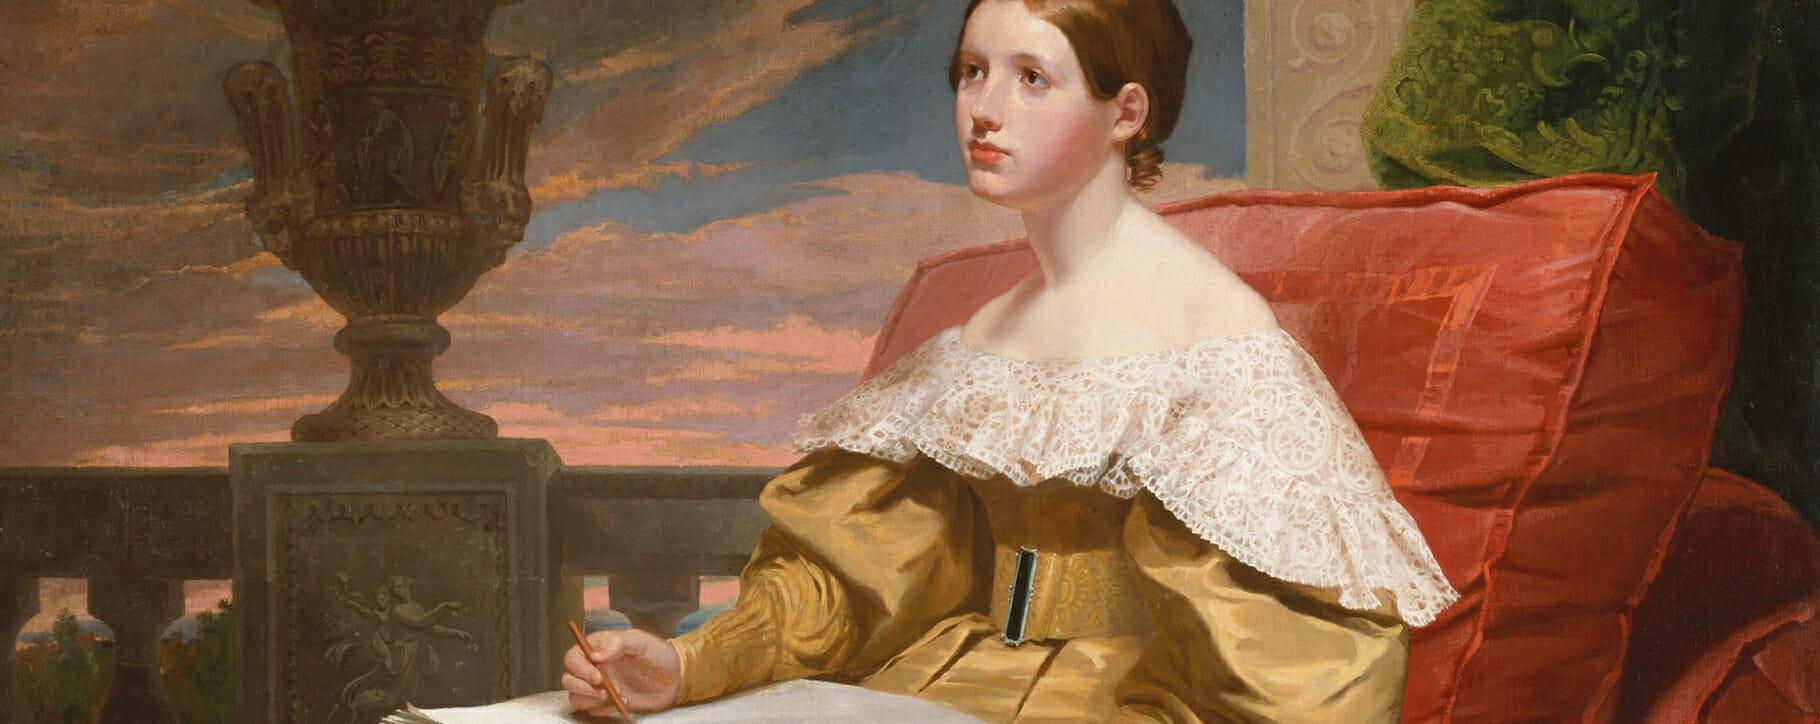 Samuel F. B. Morse B Victorian Portrait